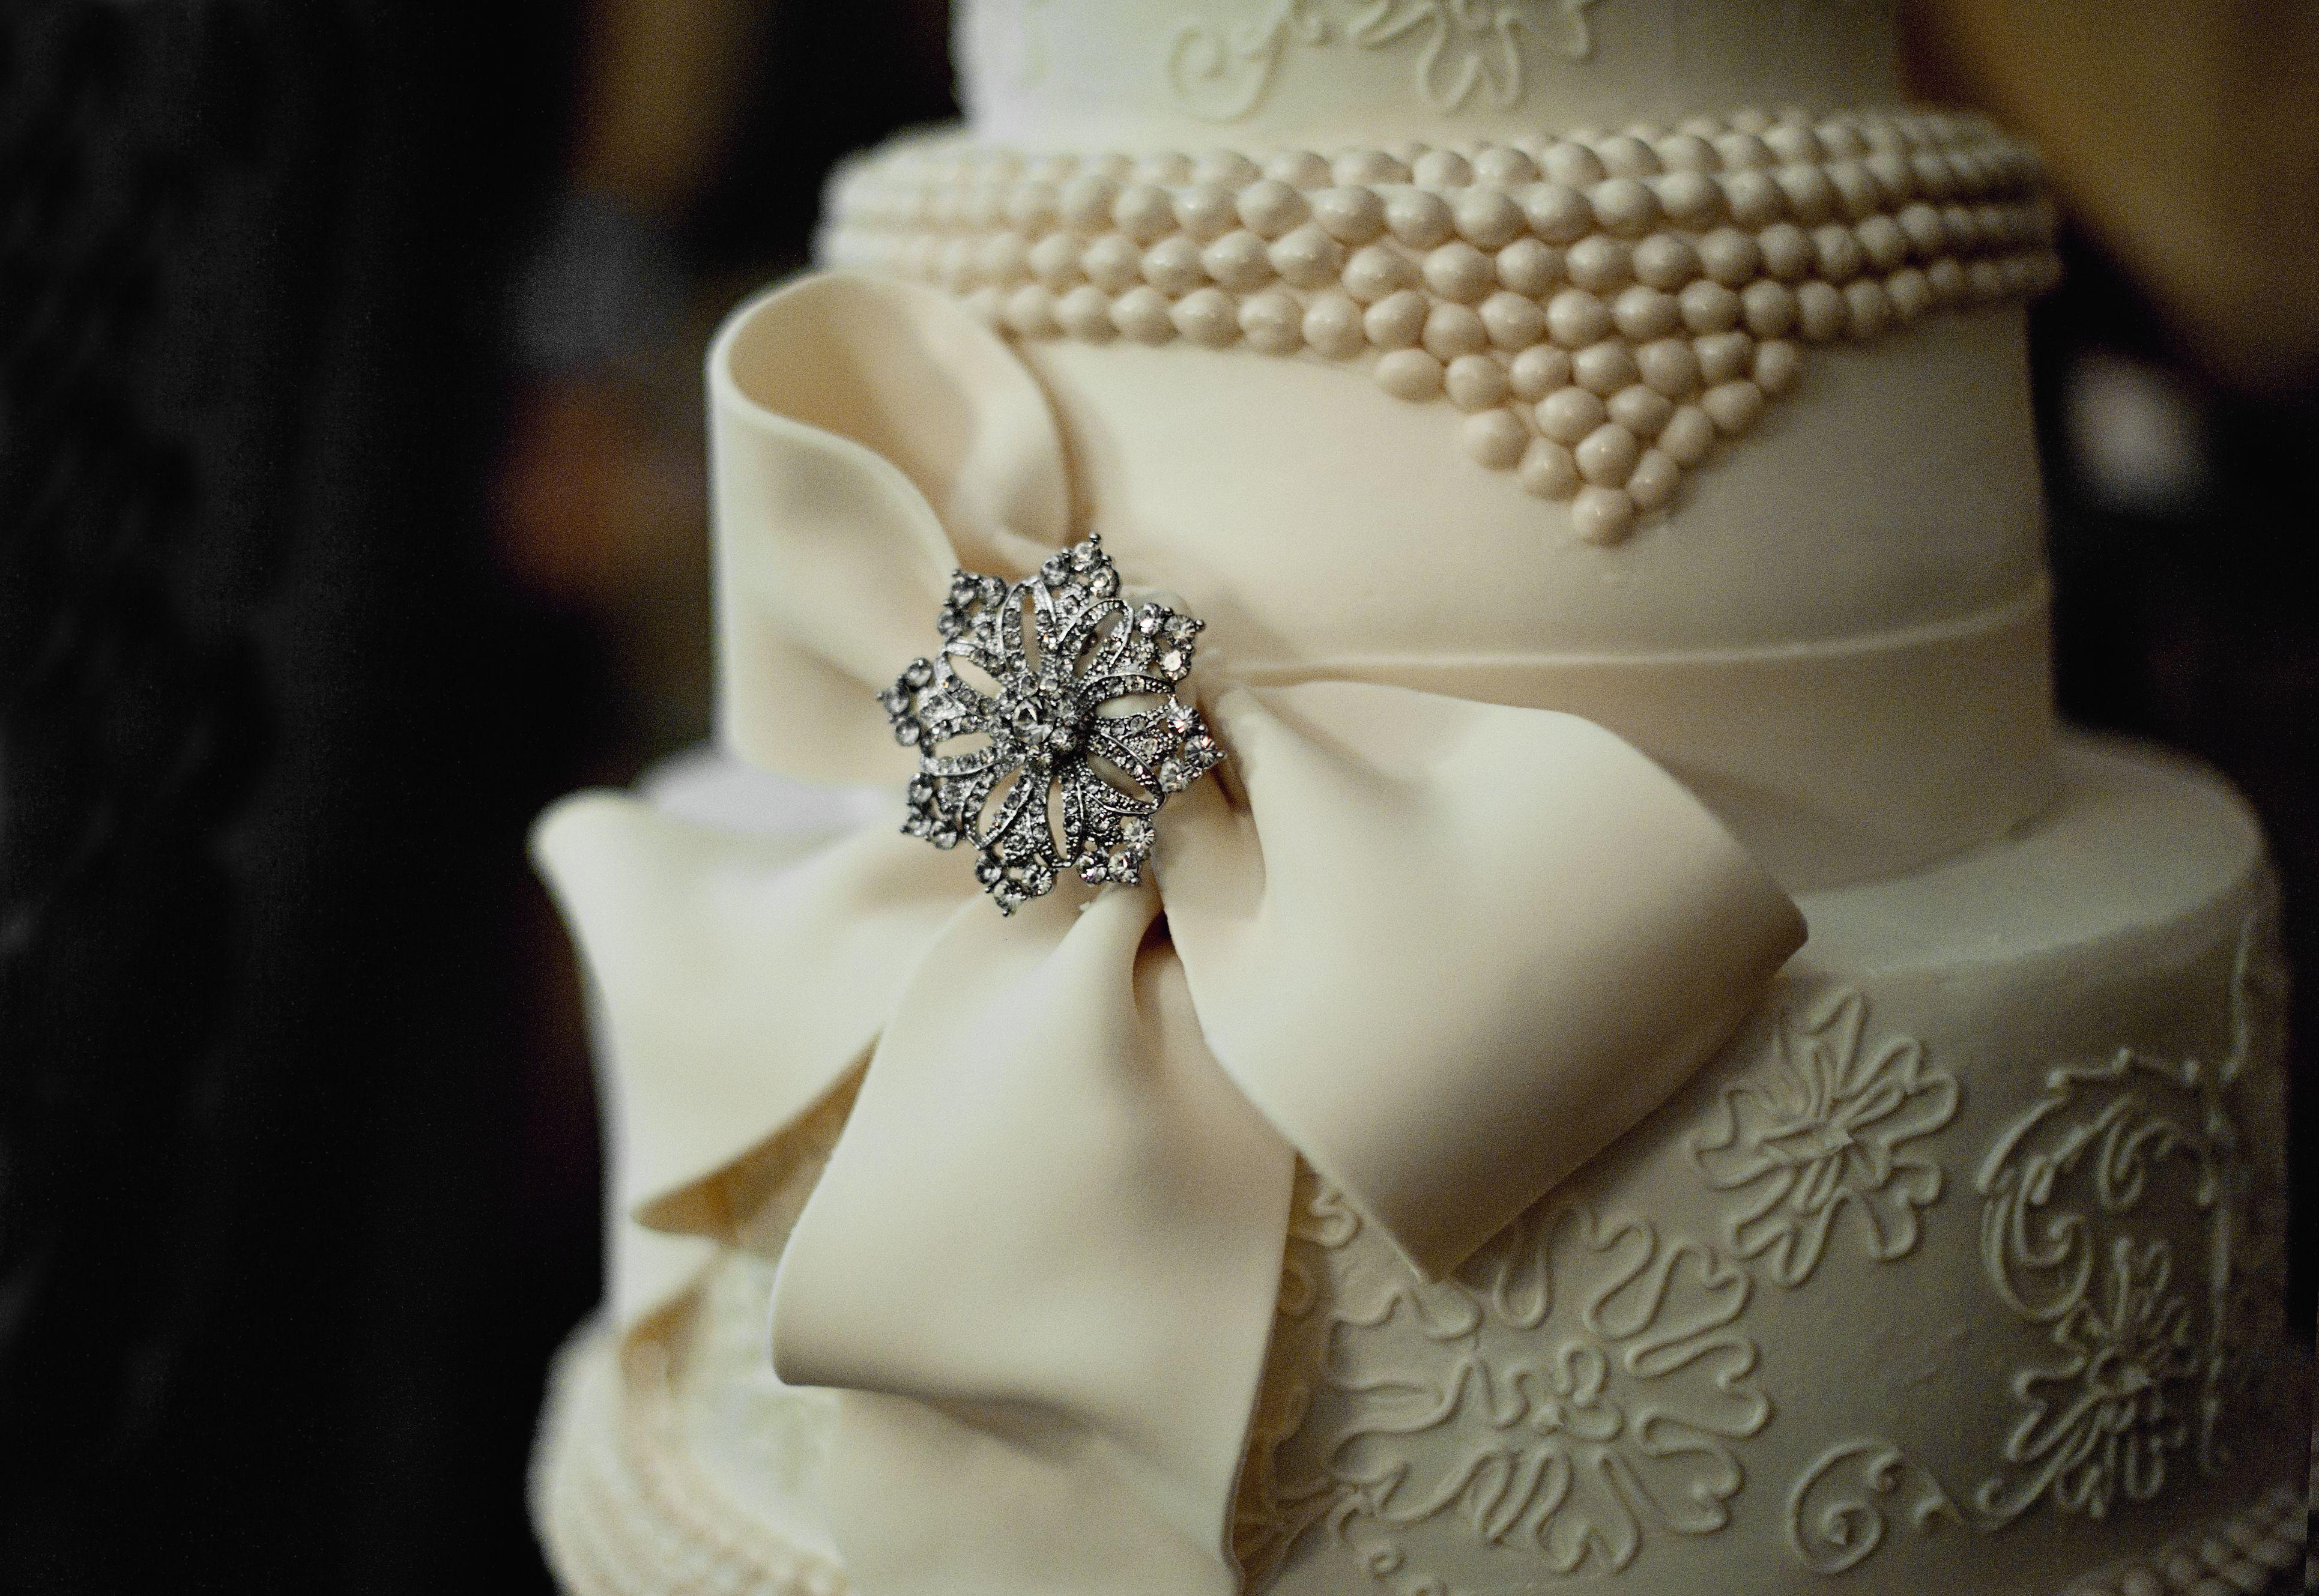 Sparkly Vineyard Wedding Wedding Cake Cake And Weddings - Ivanka Wedding Cake